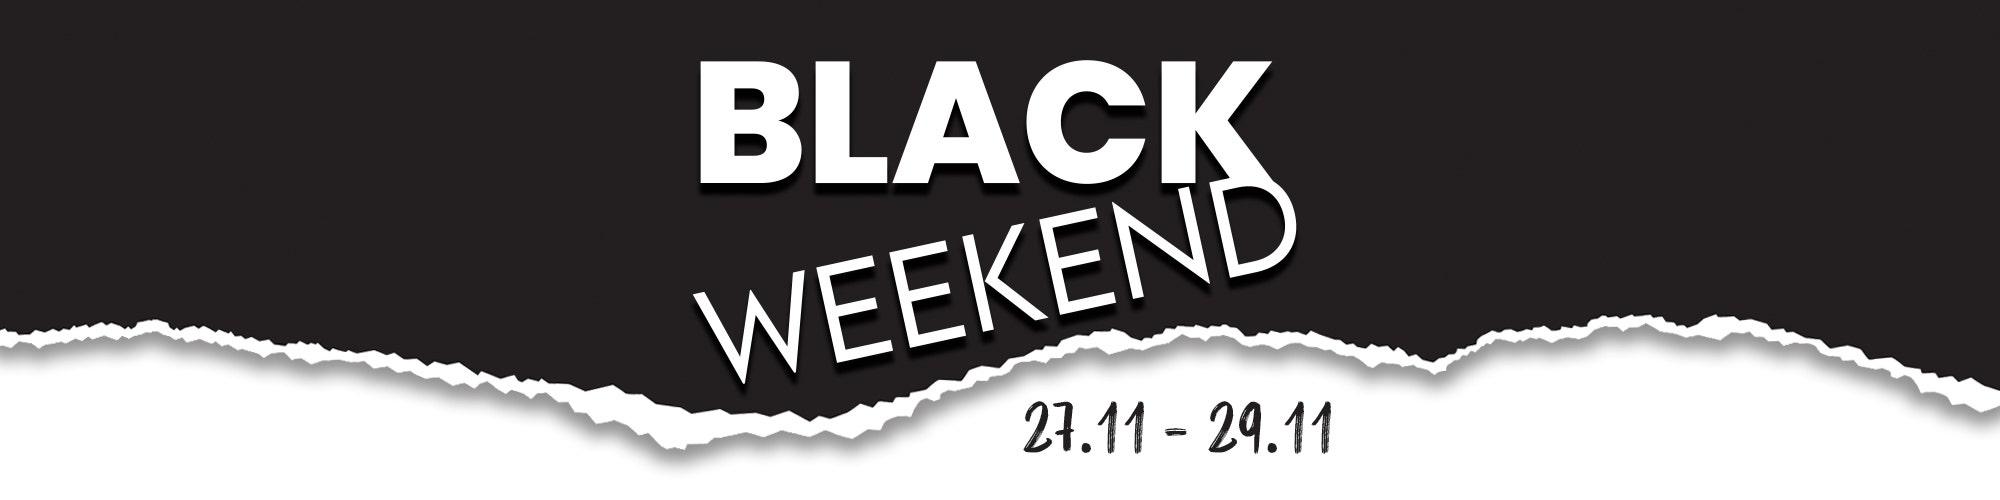 Black Weekend hos Outland.no 27.11-29.11